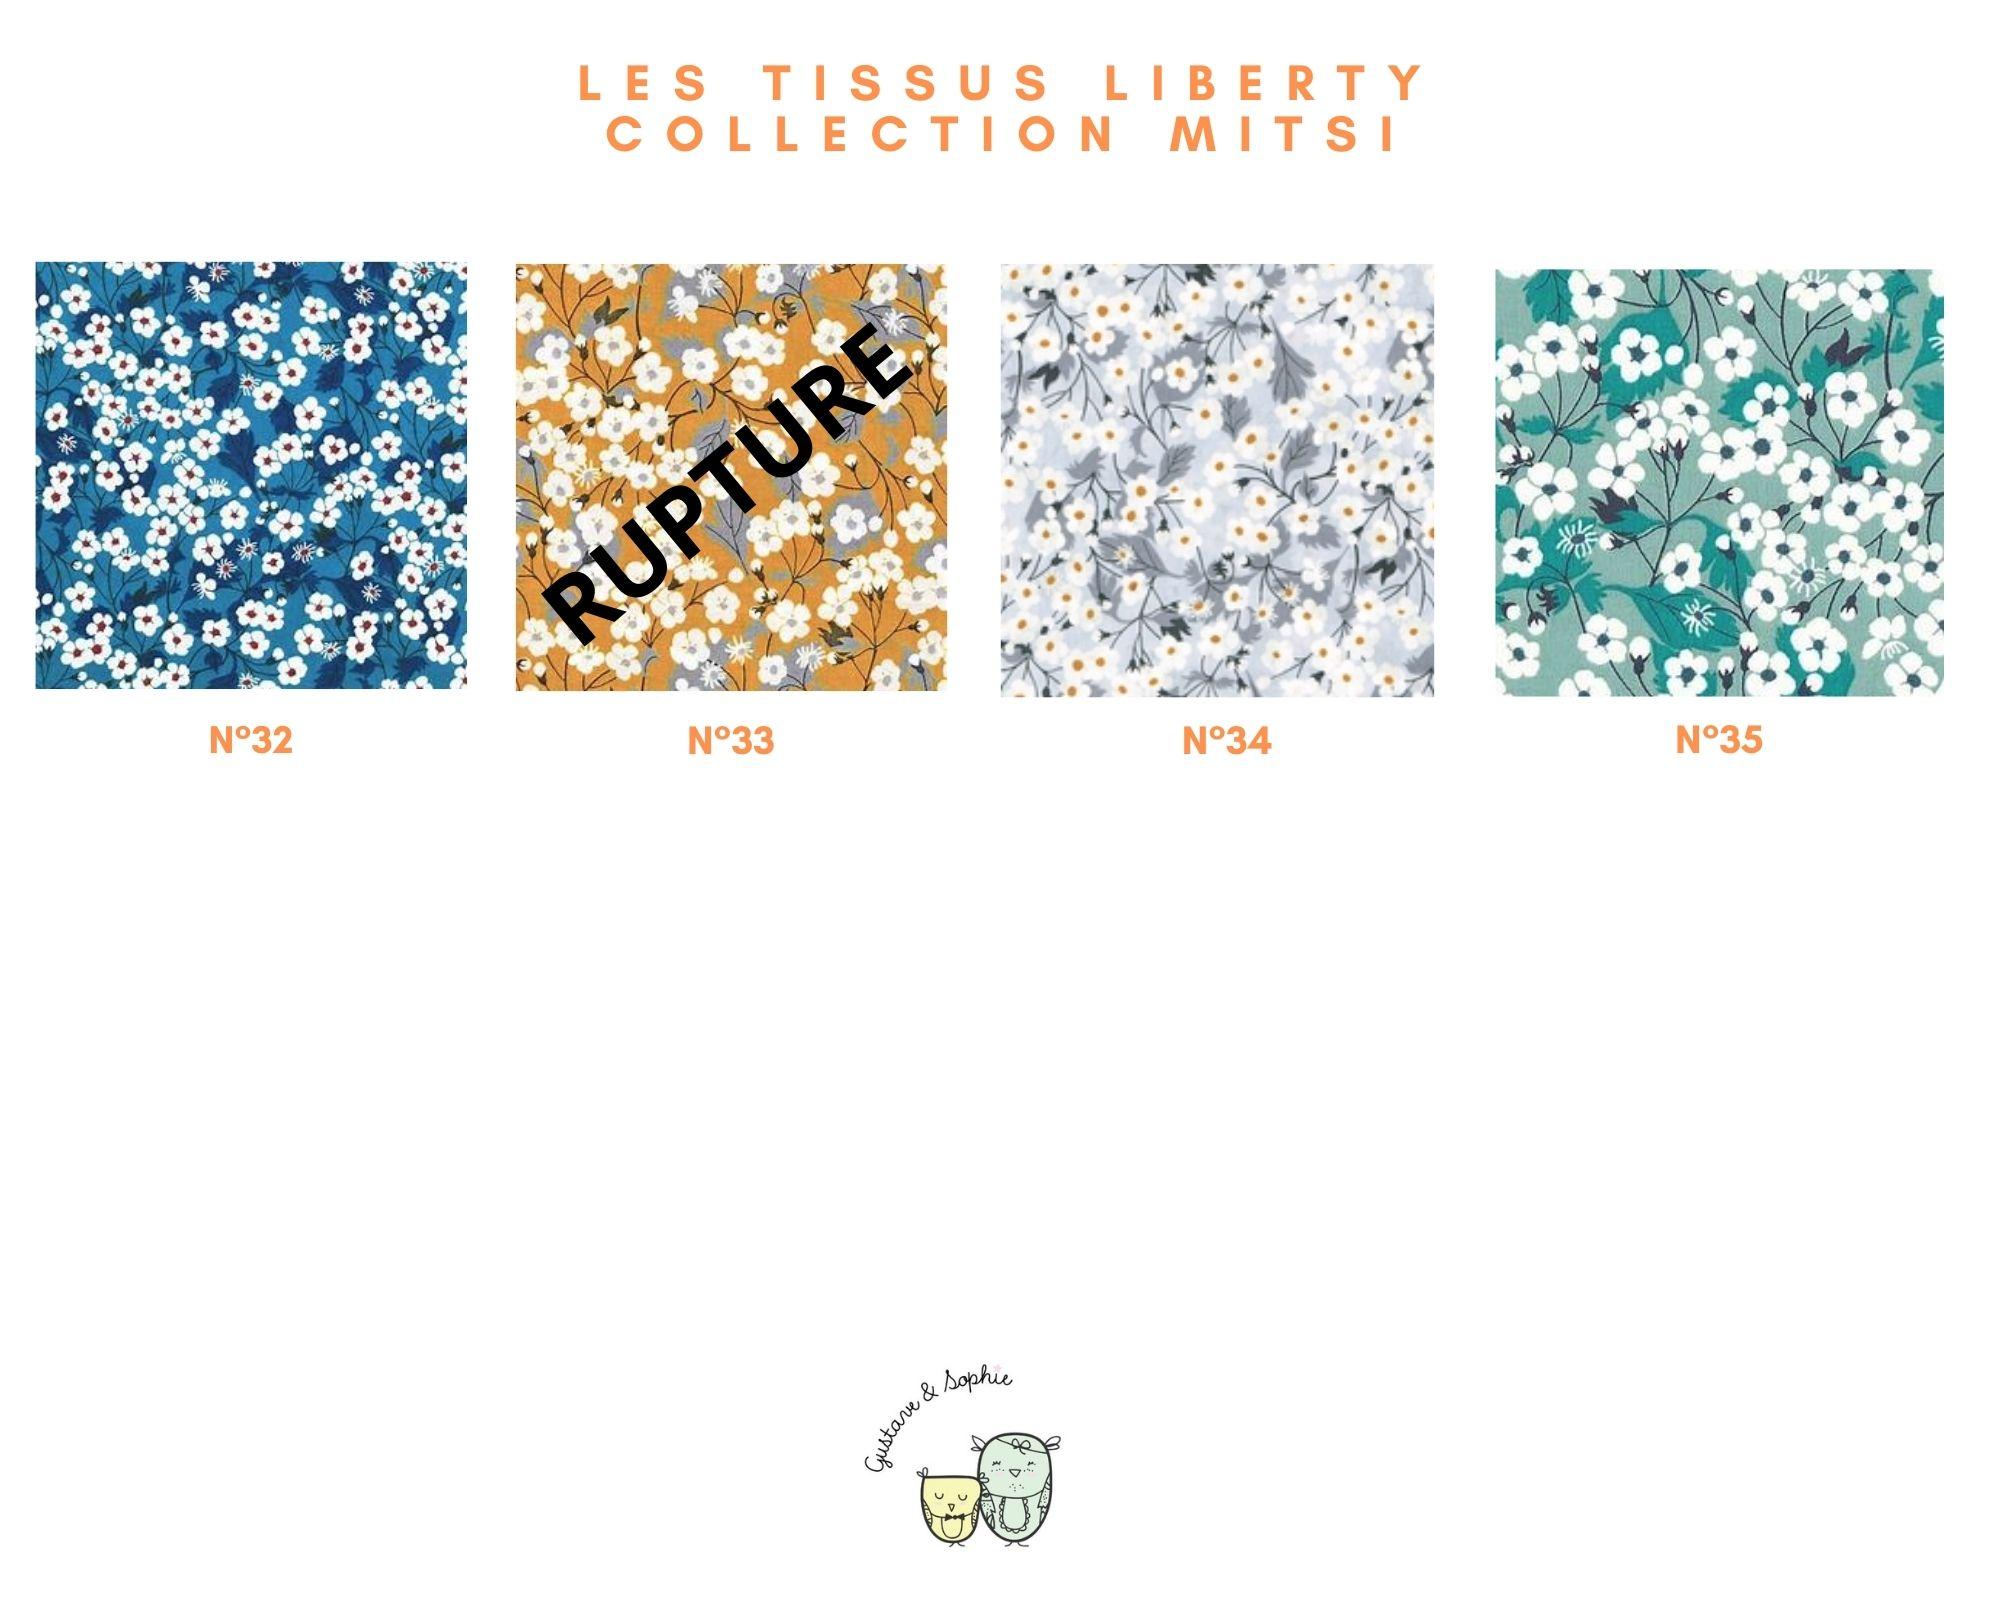 tissus-liberty-mitsi-plaquette-choix-tissus-commande-creation-enfant-gustavesophie